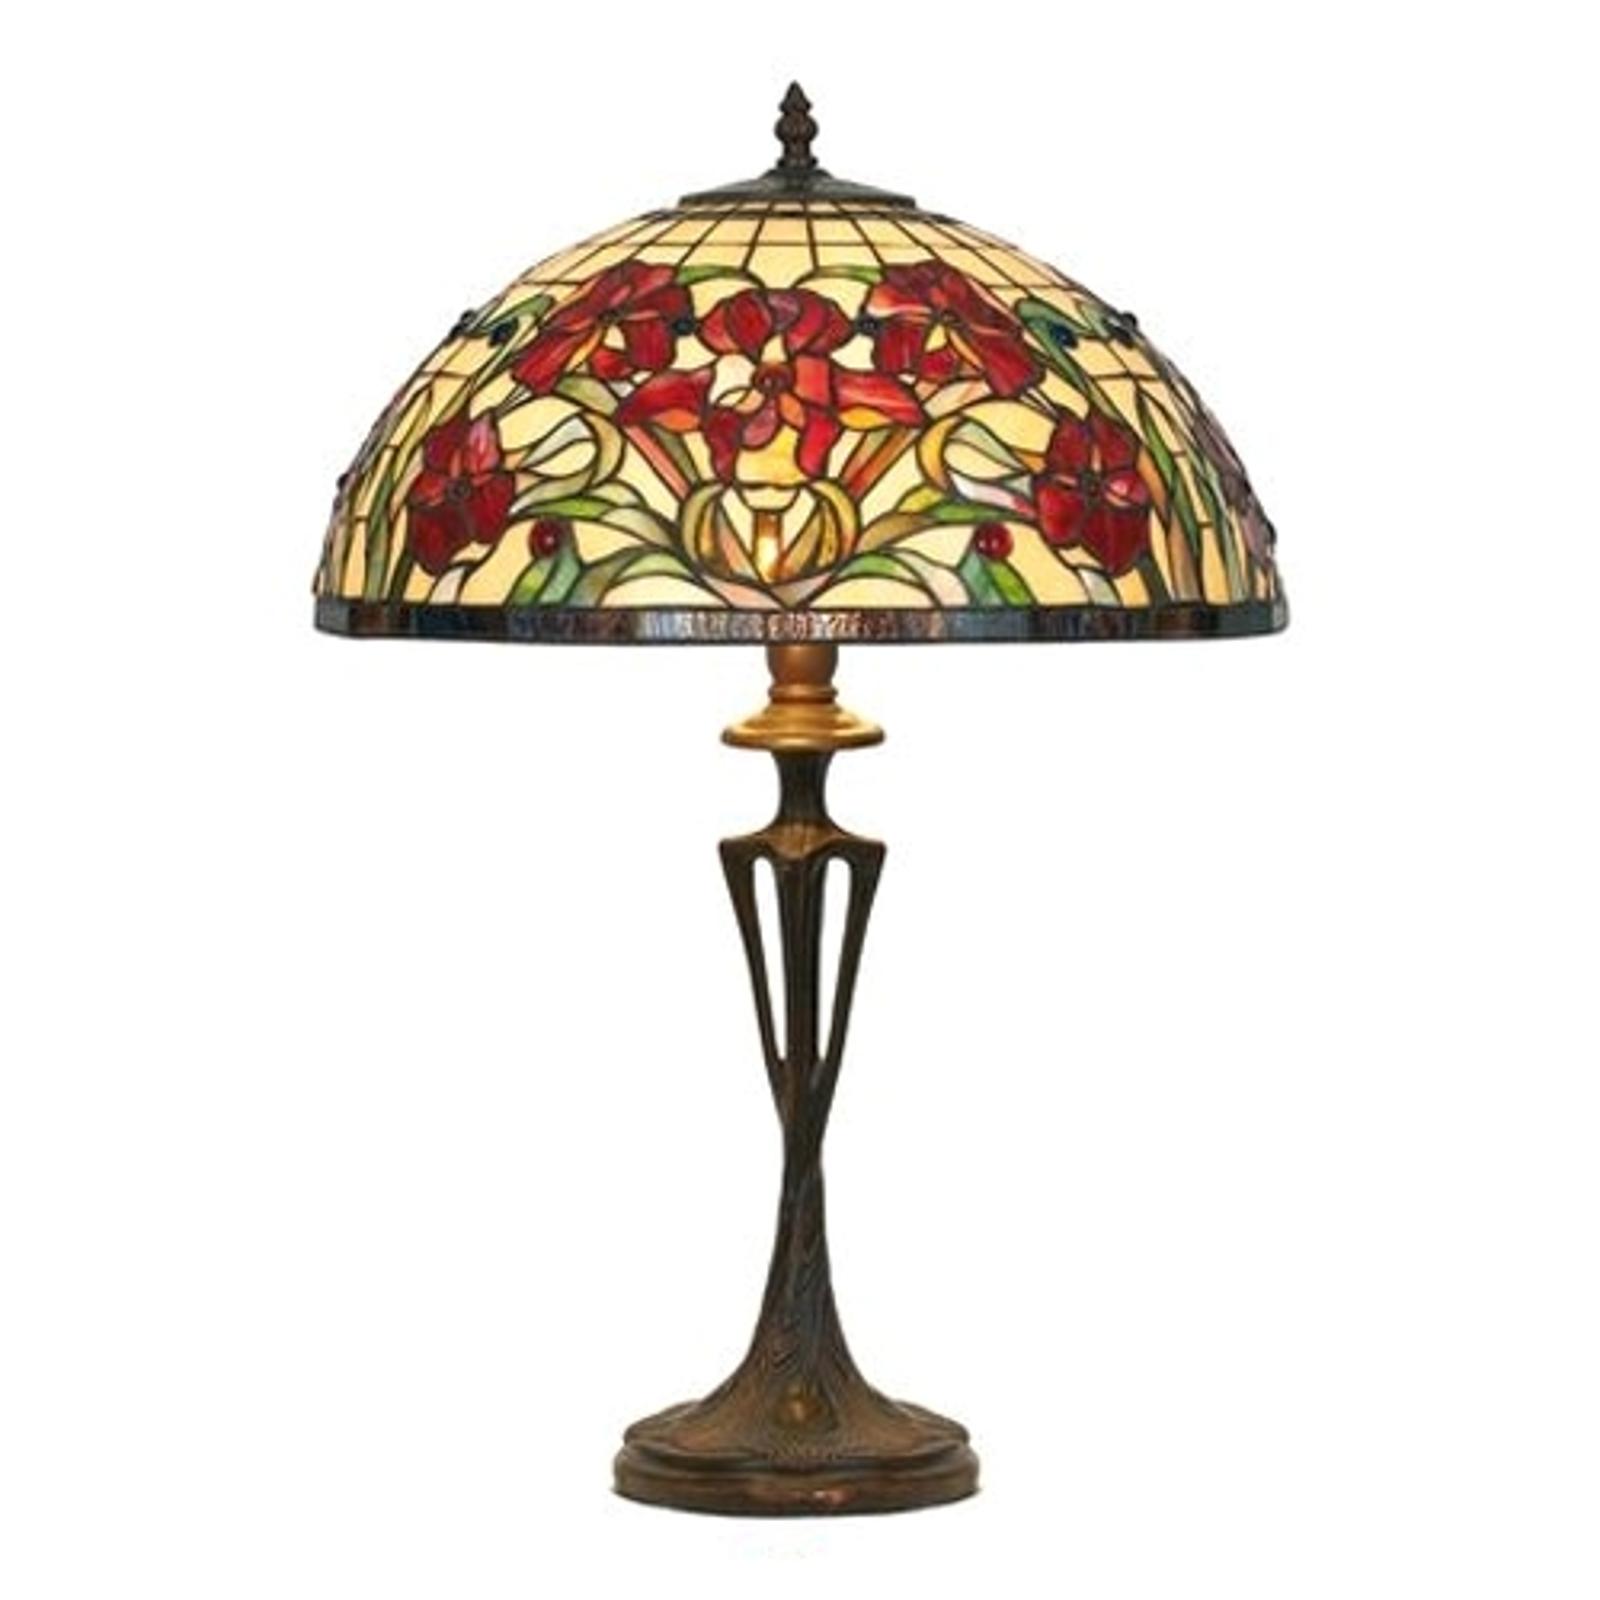 Lampe à poser Eline au style Tiffany